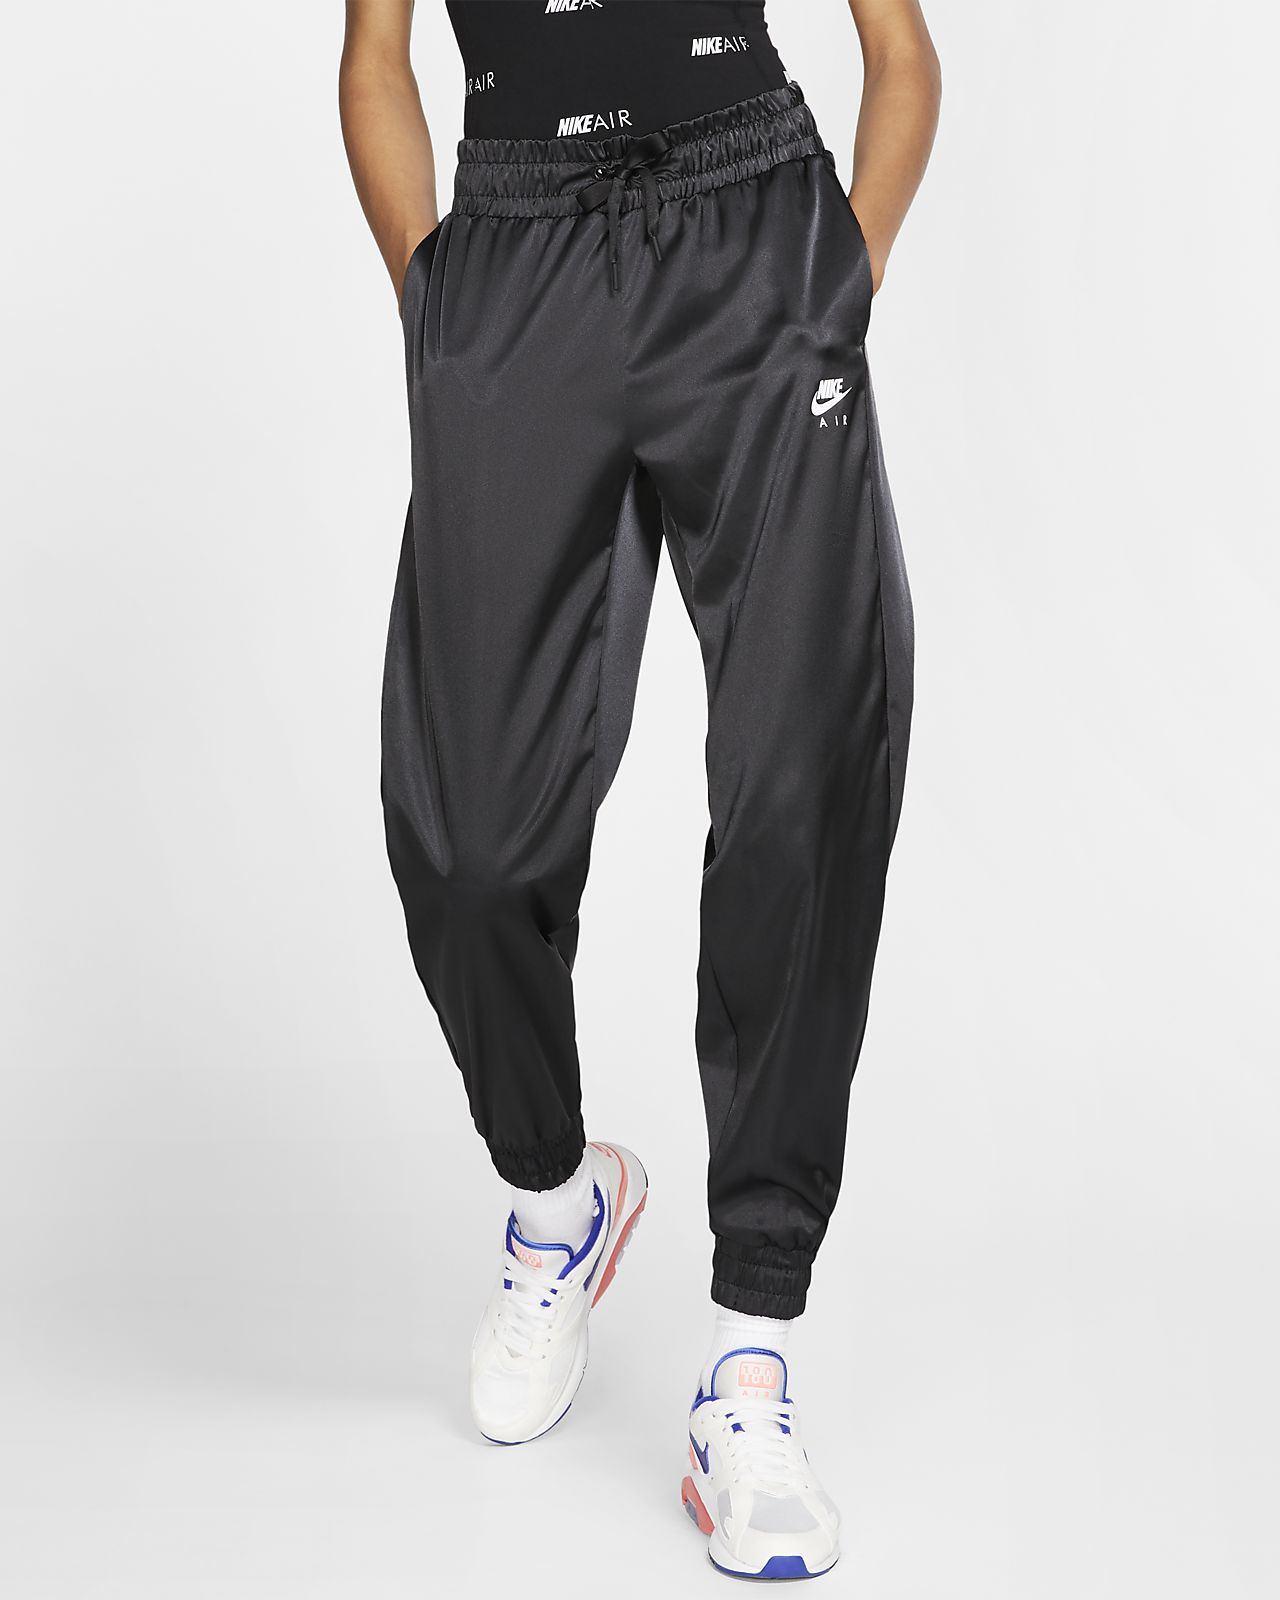 Track pants Nike Air Satin - Donna